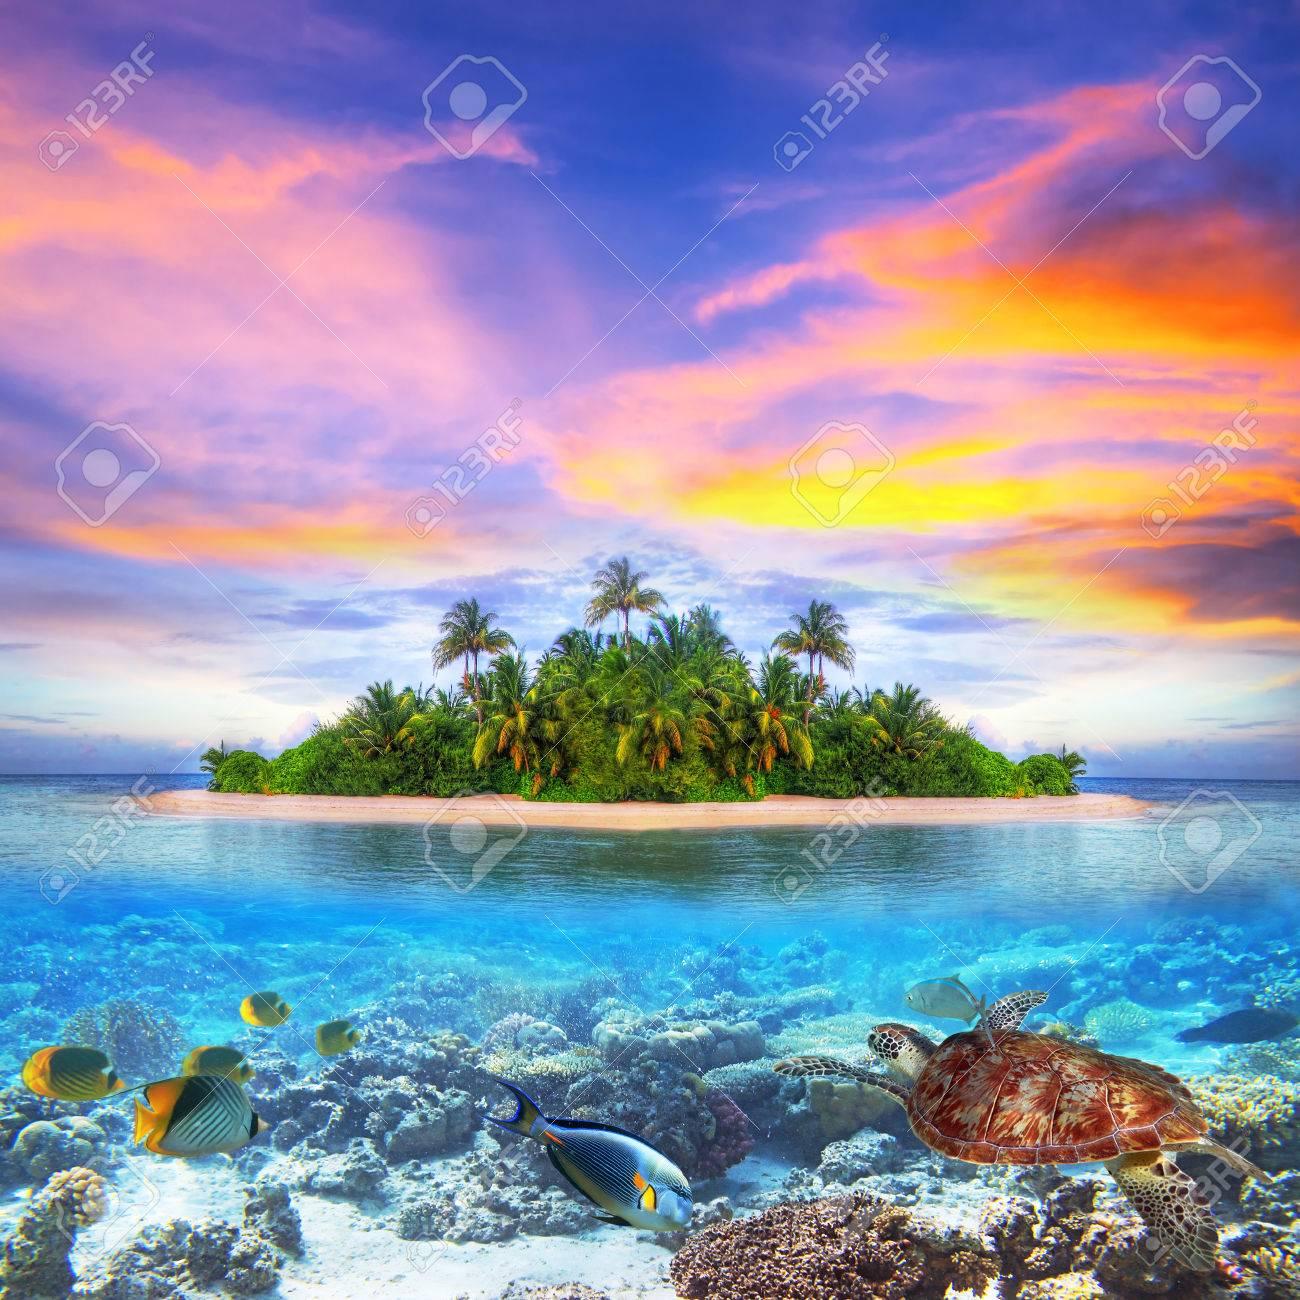 Marine life at tropical island of Maldives Stock Photo - 55104734